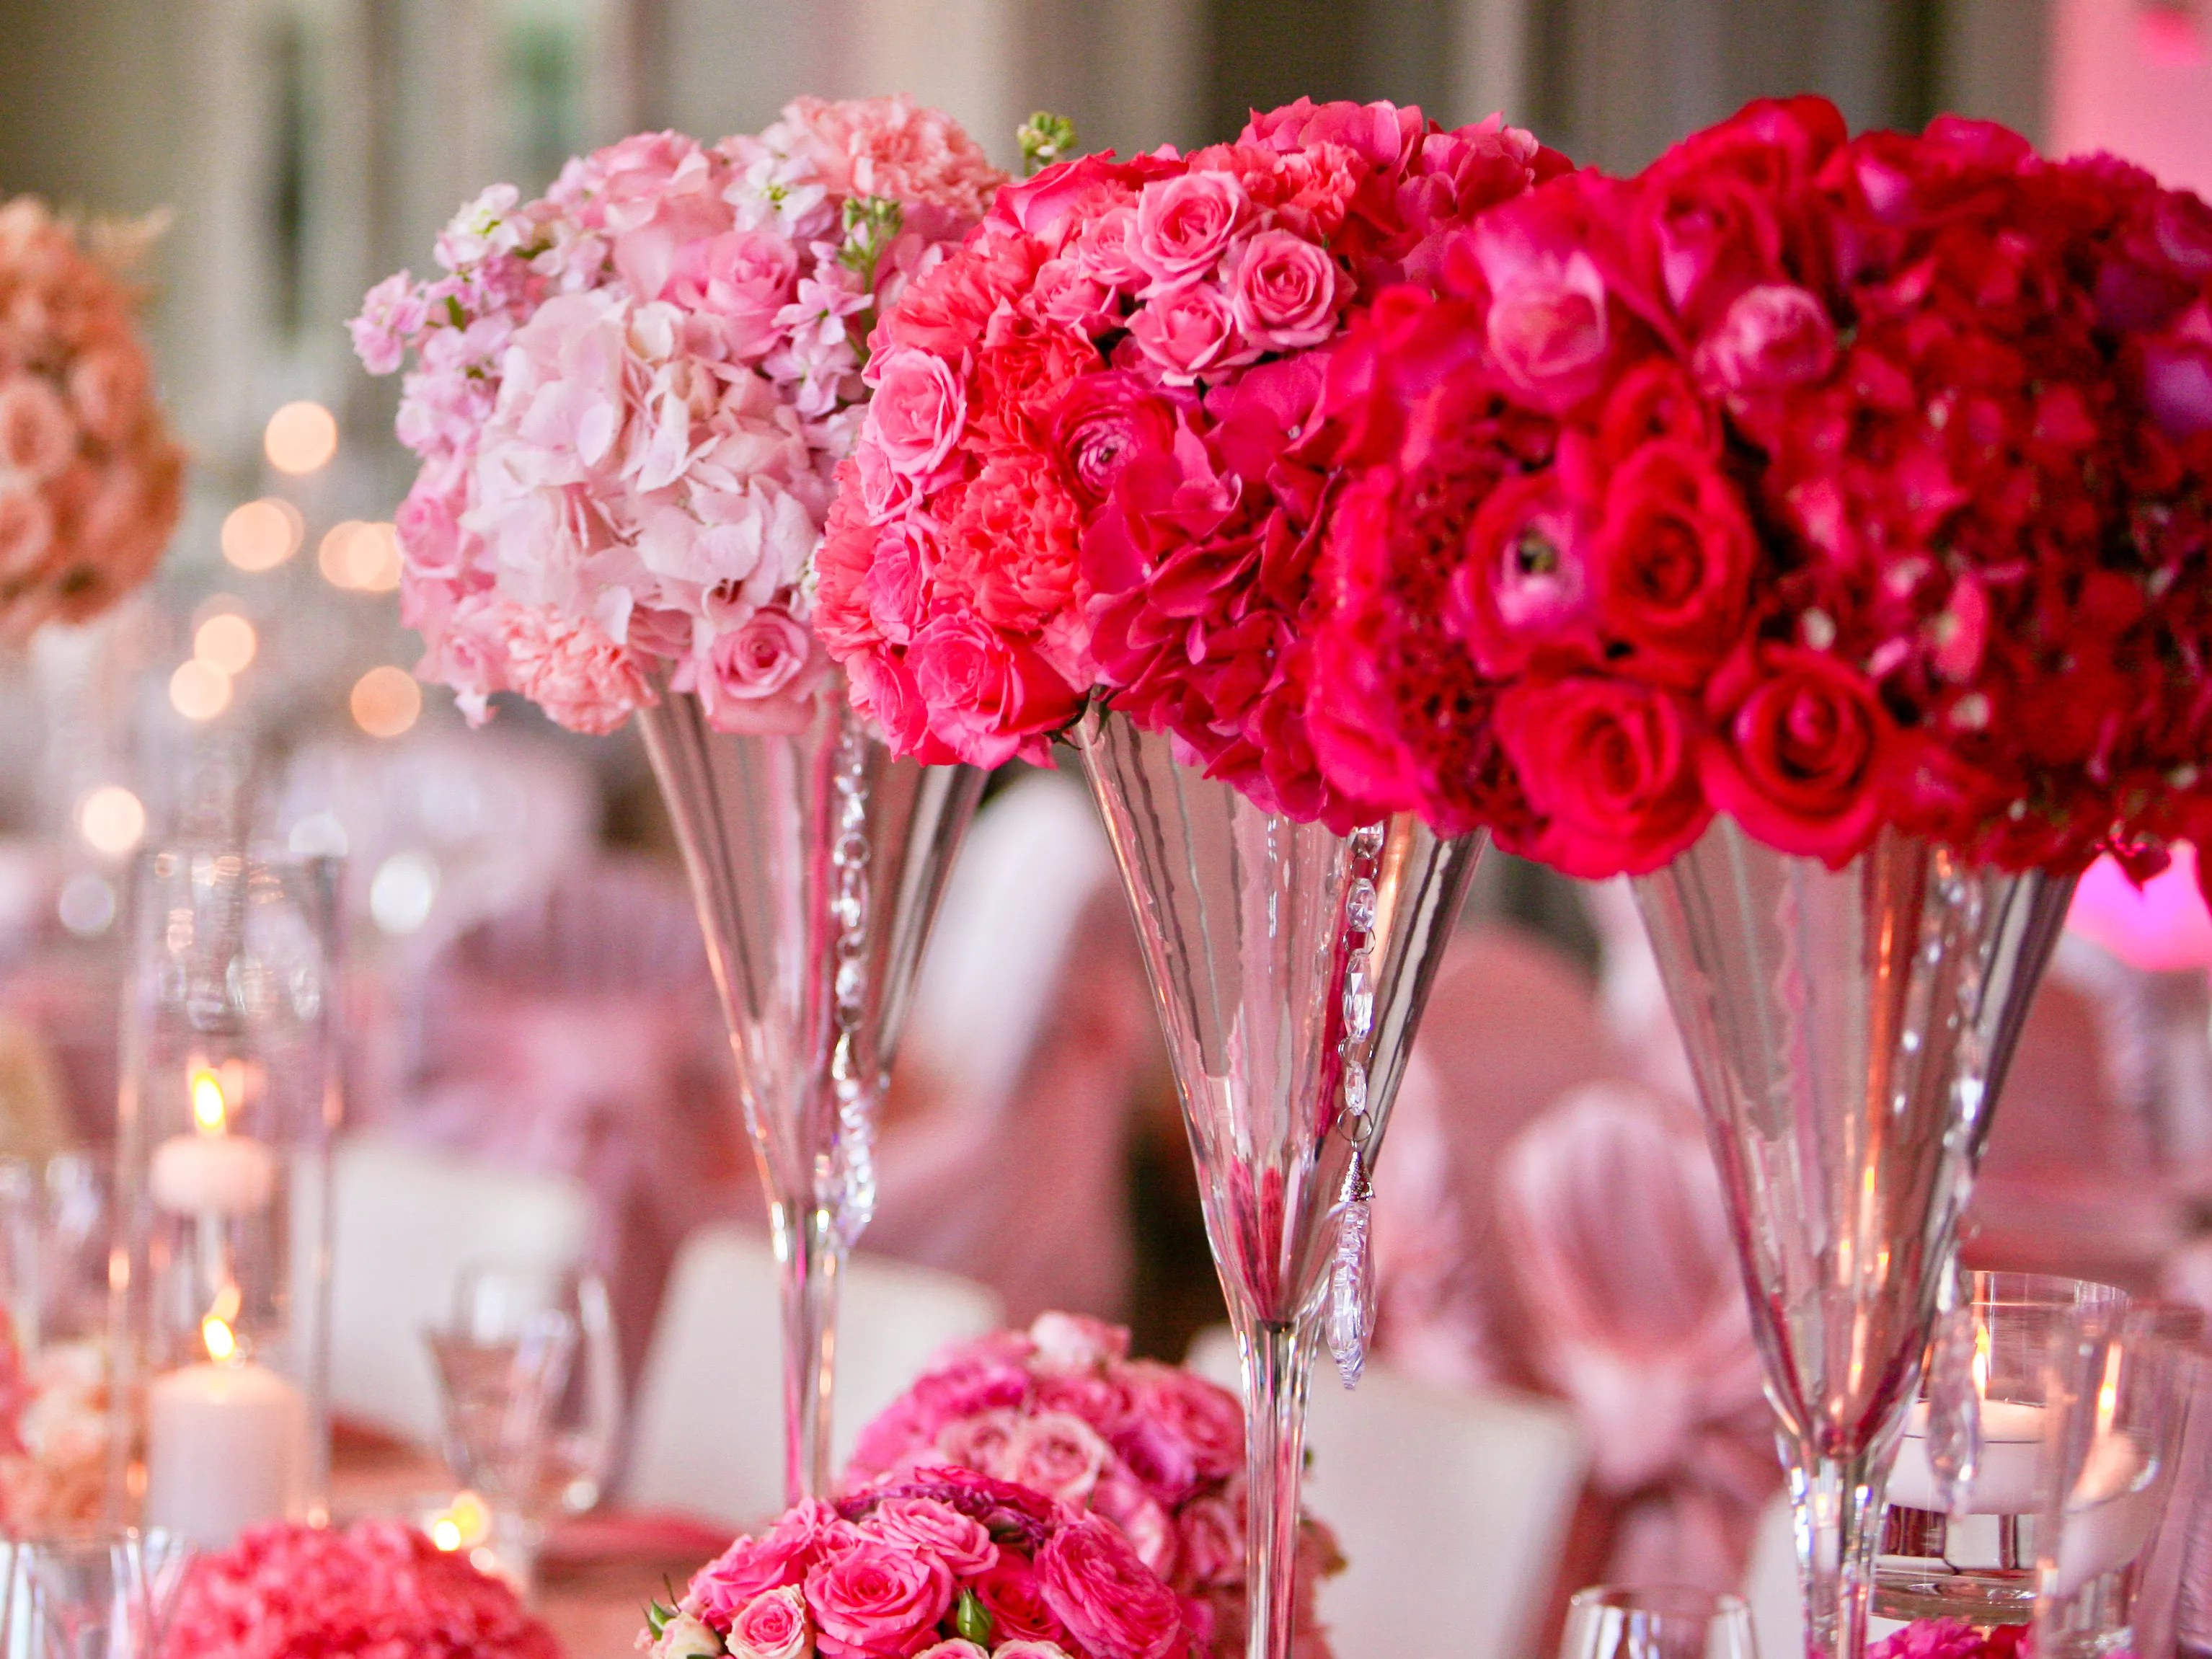 Wedding Flowers: Roses 101